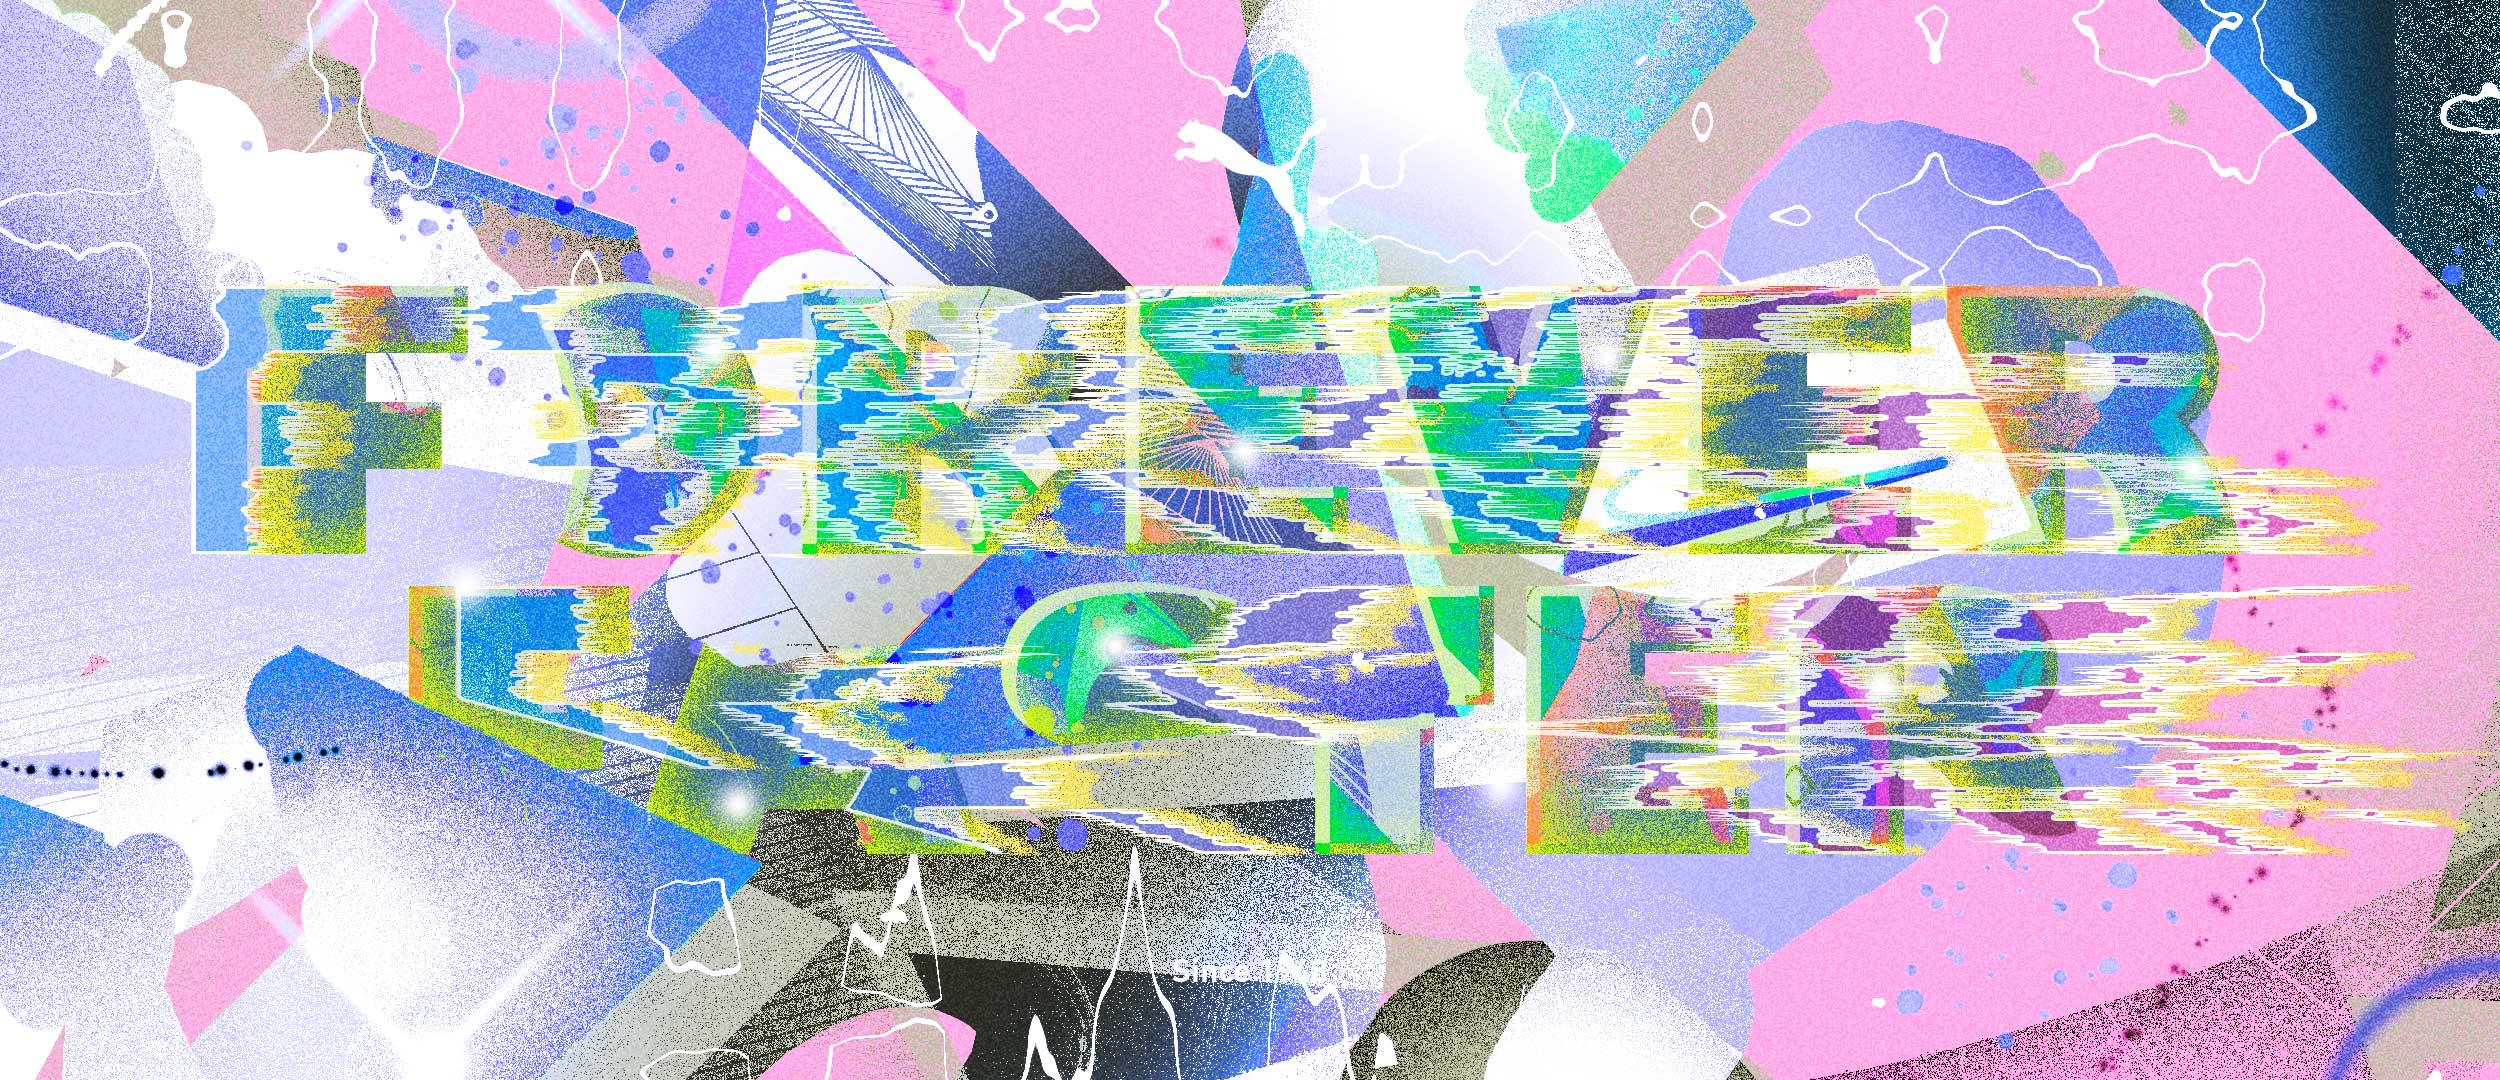 RS0_Concept_03_Frame_01